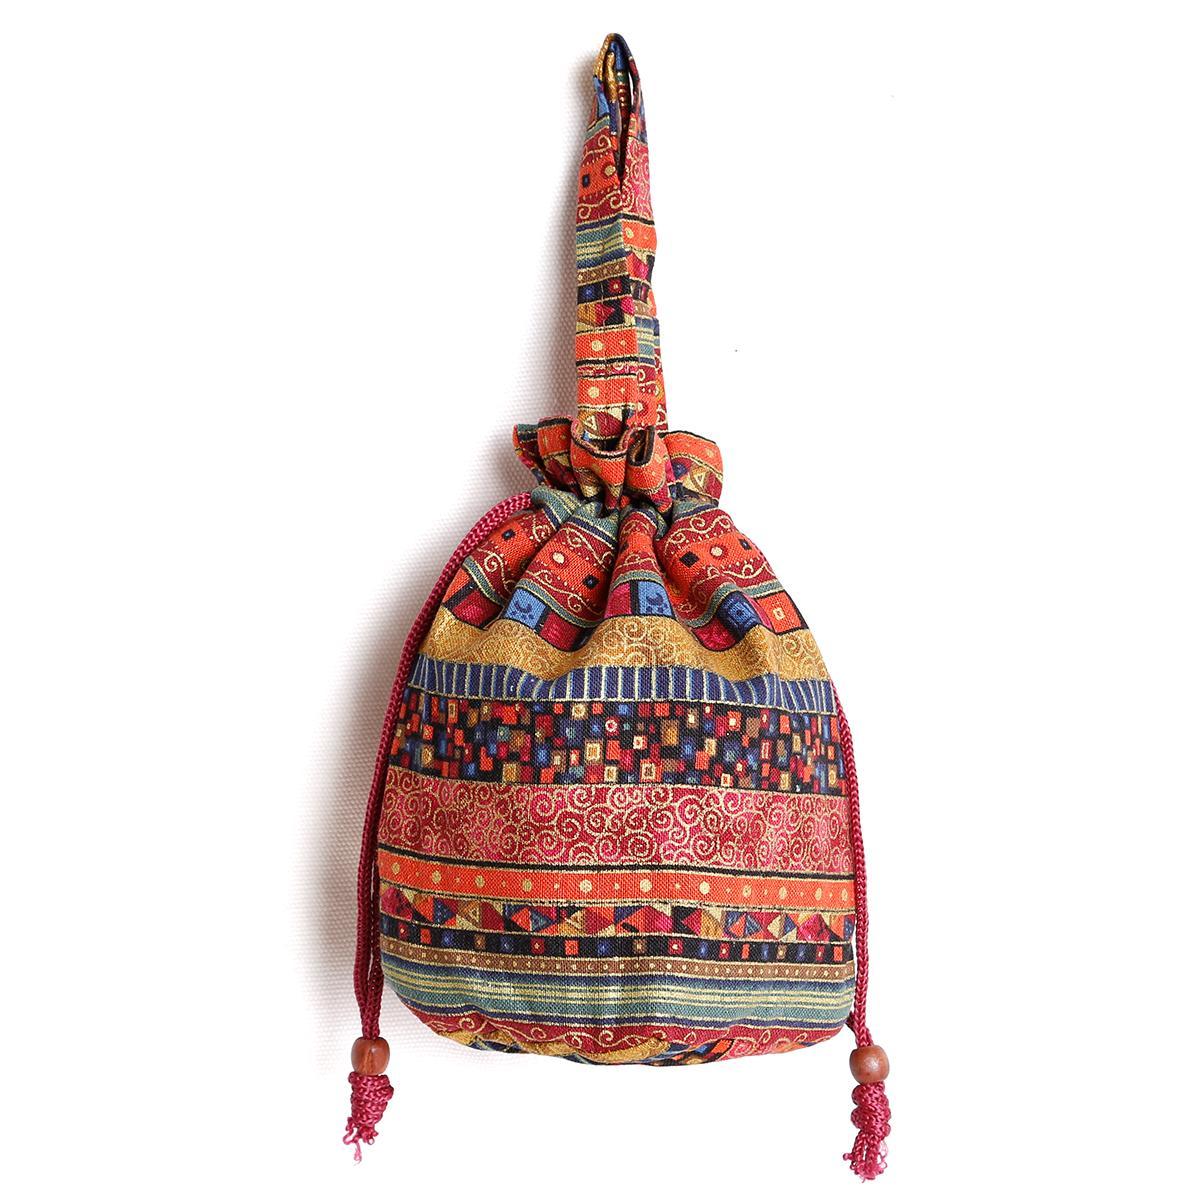 Sastra Tas Tenteng Selubung Bahu dengan Satu Tali Selempang Miring Dompet Koin Tas Kecil Tas Kain